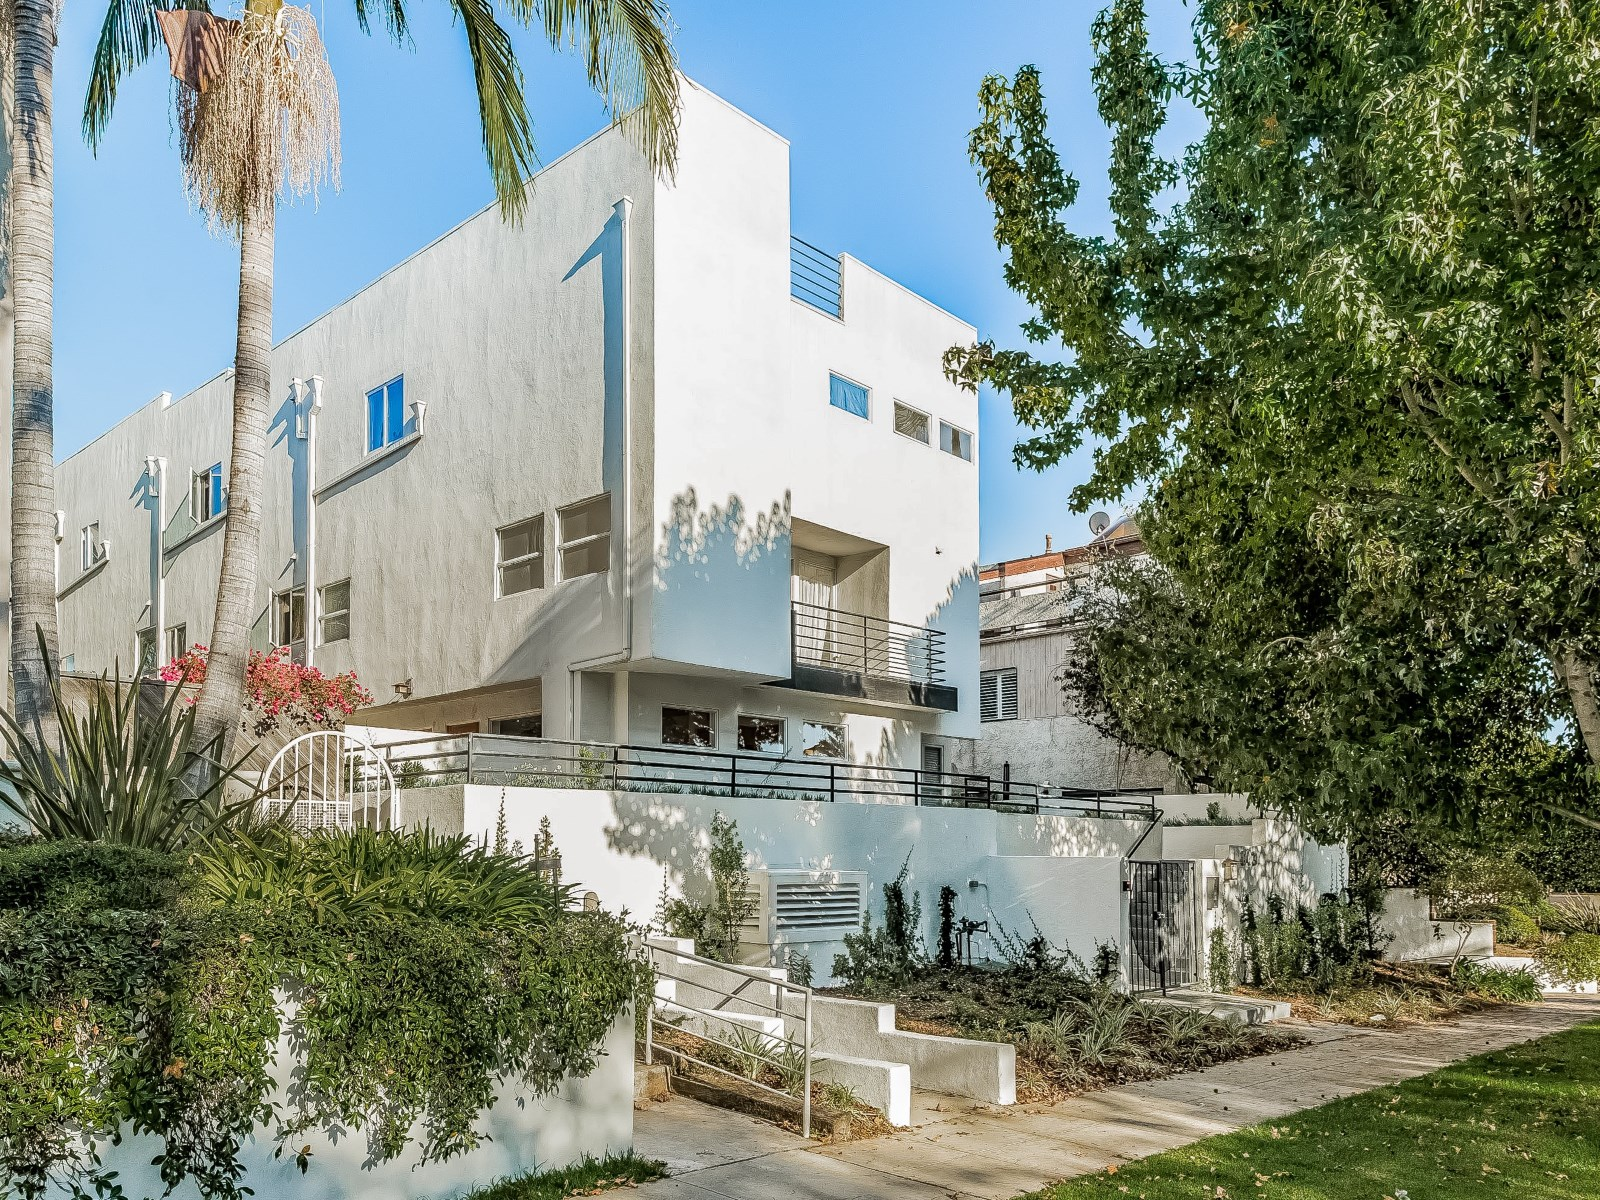 Santa Monica - 2BD2.5BA - 1,475,000.jpg